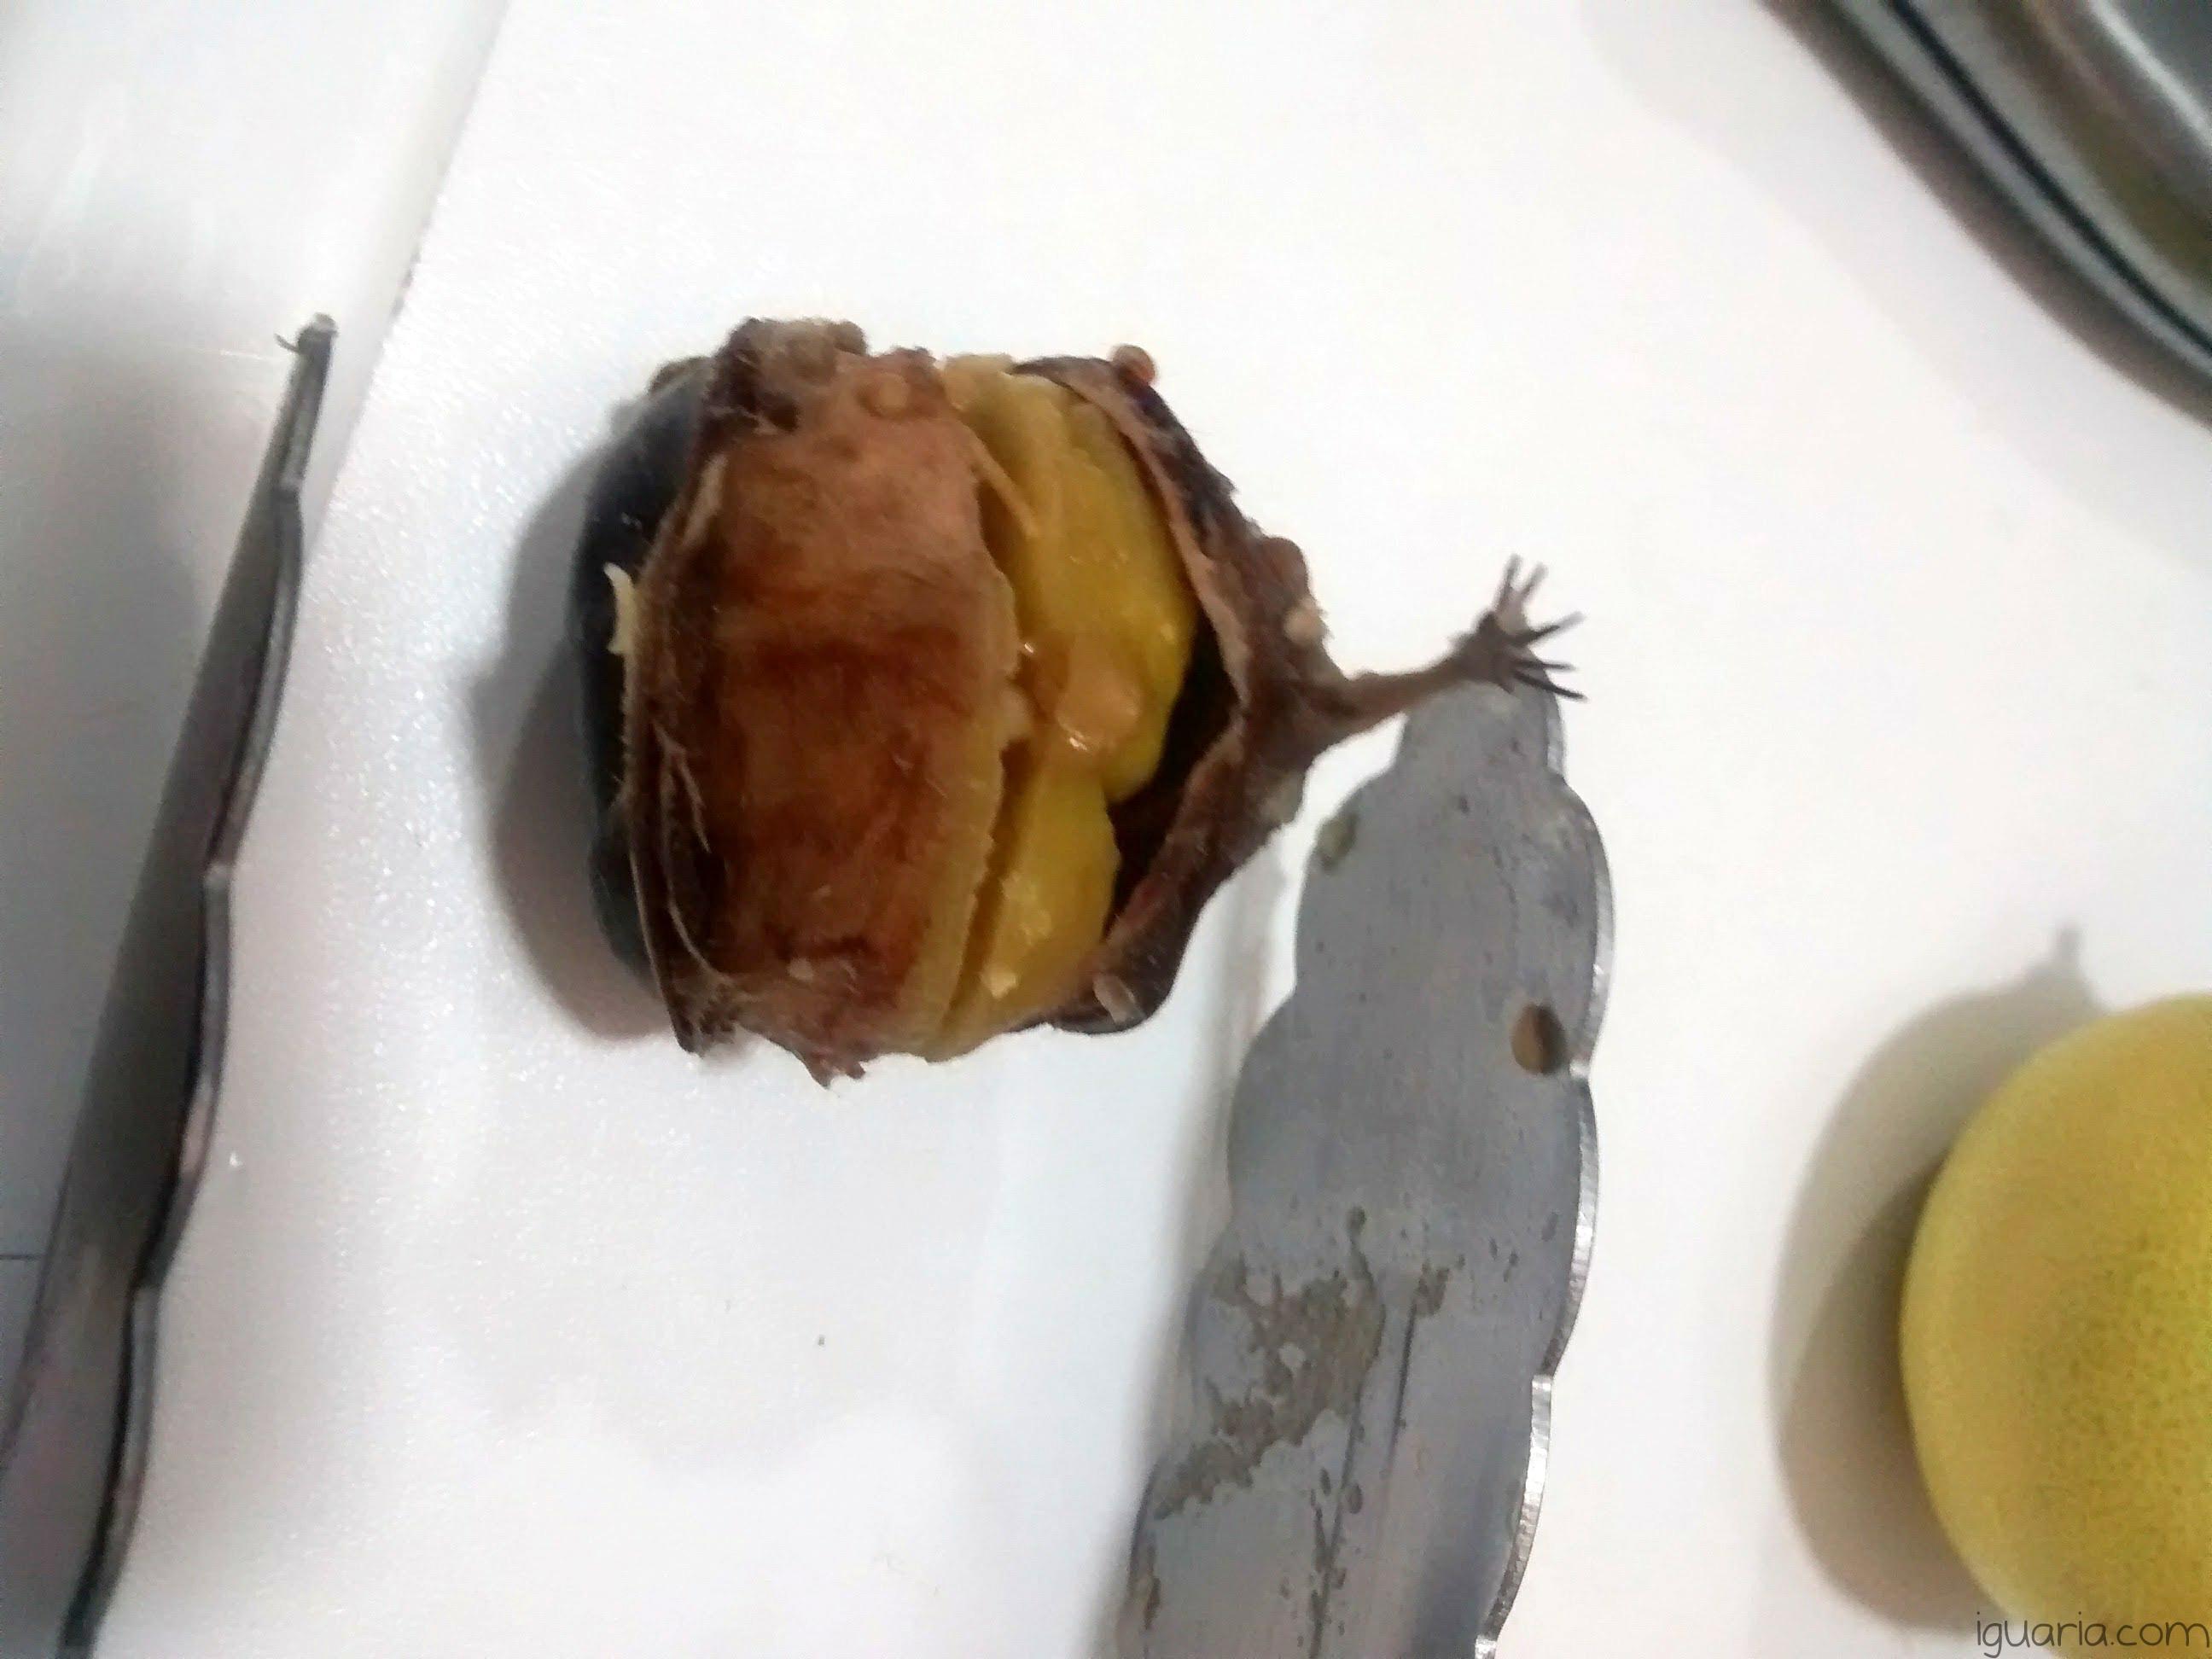 iguaria-castanha-cozida